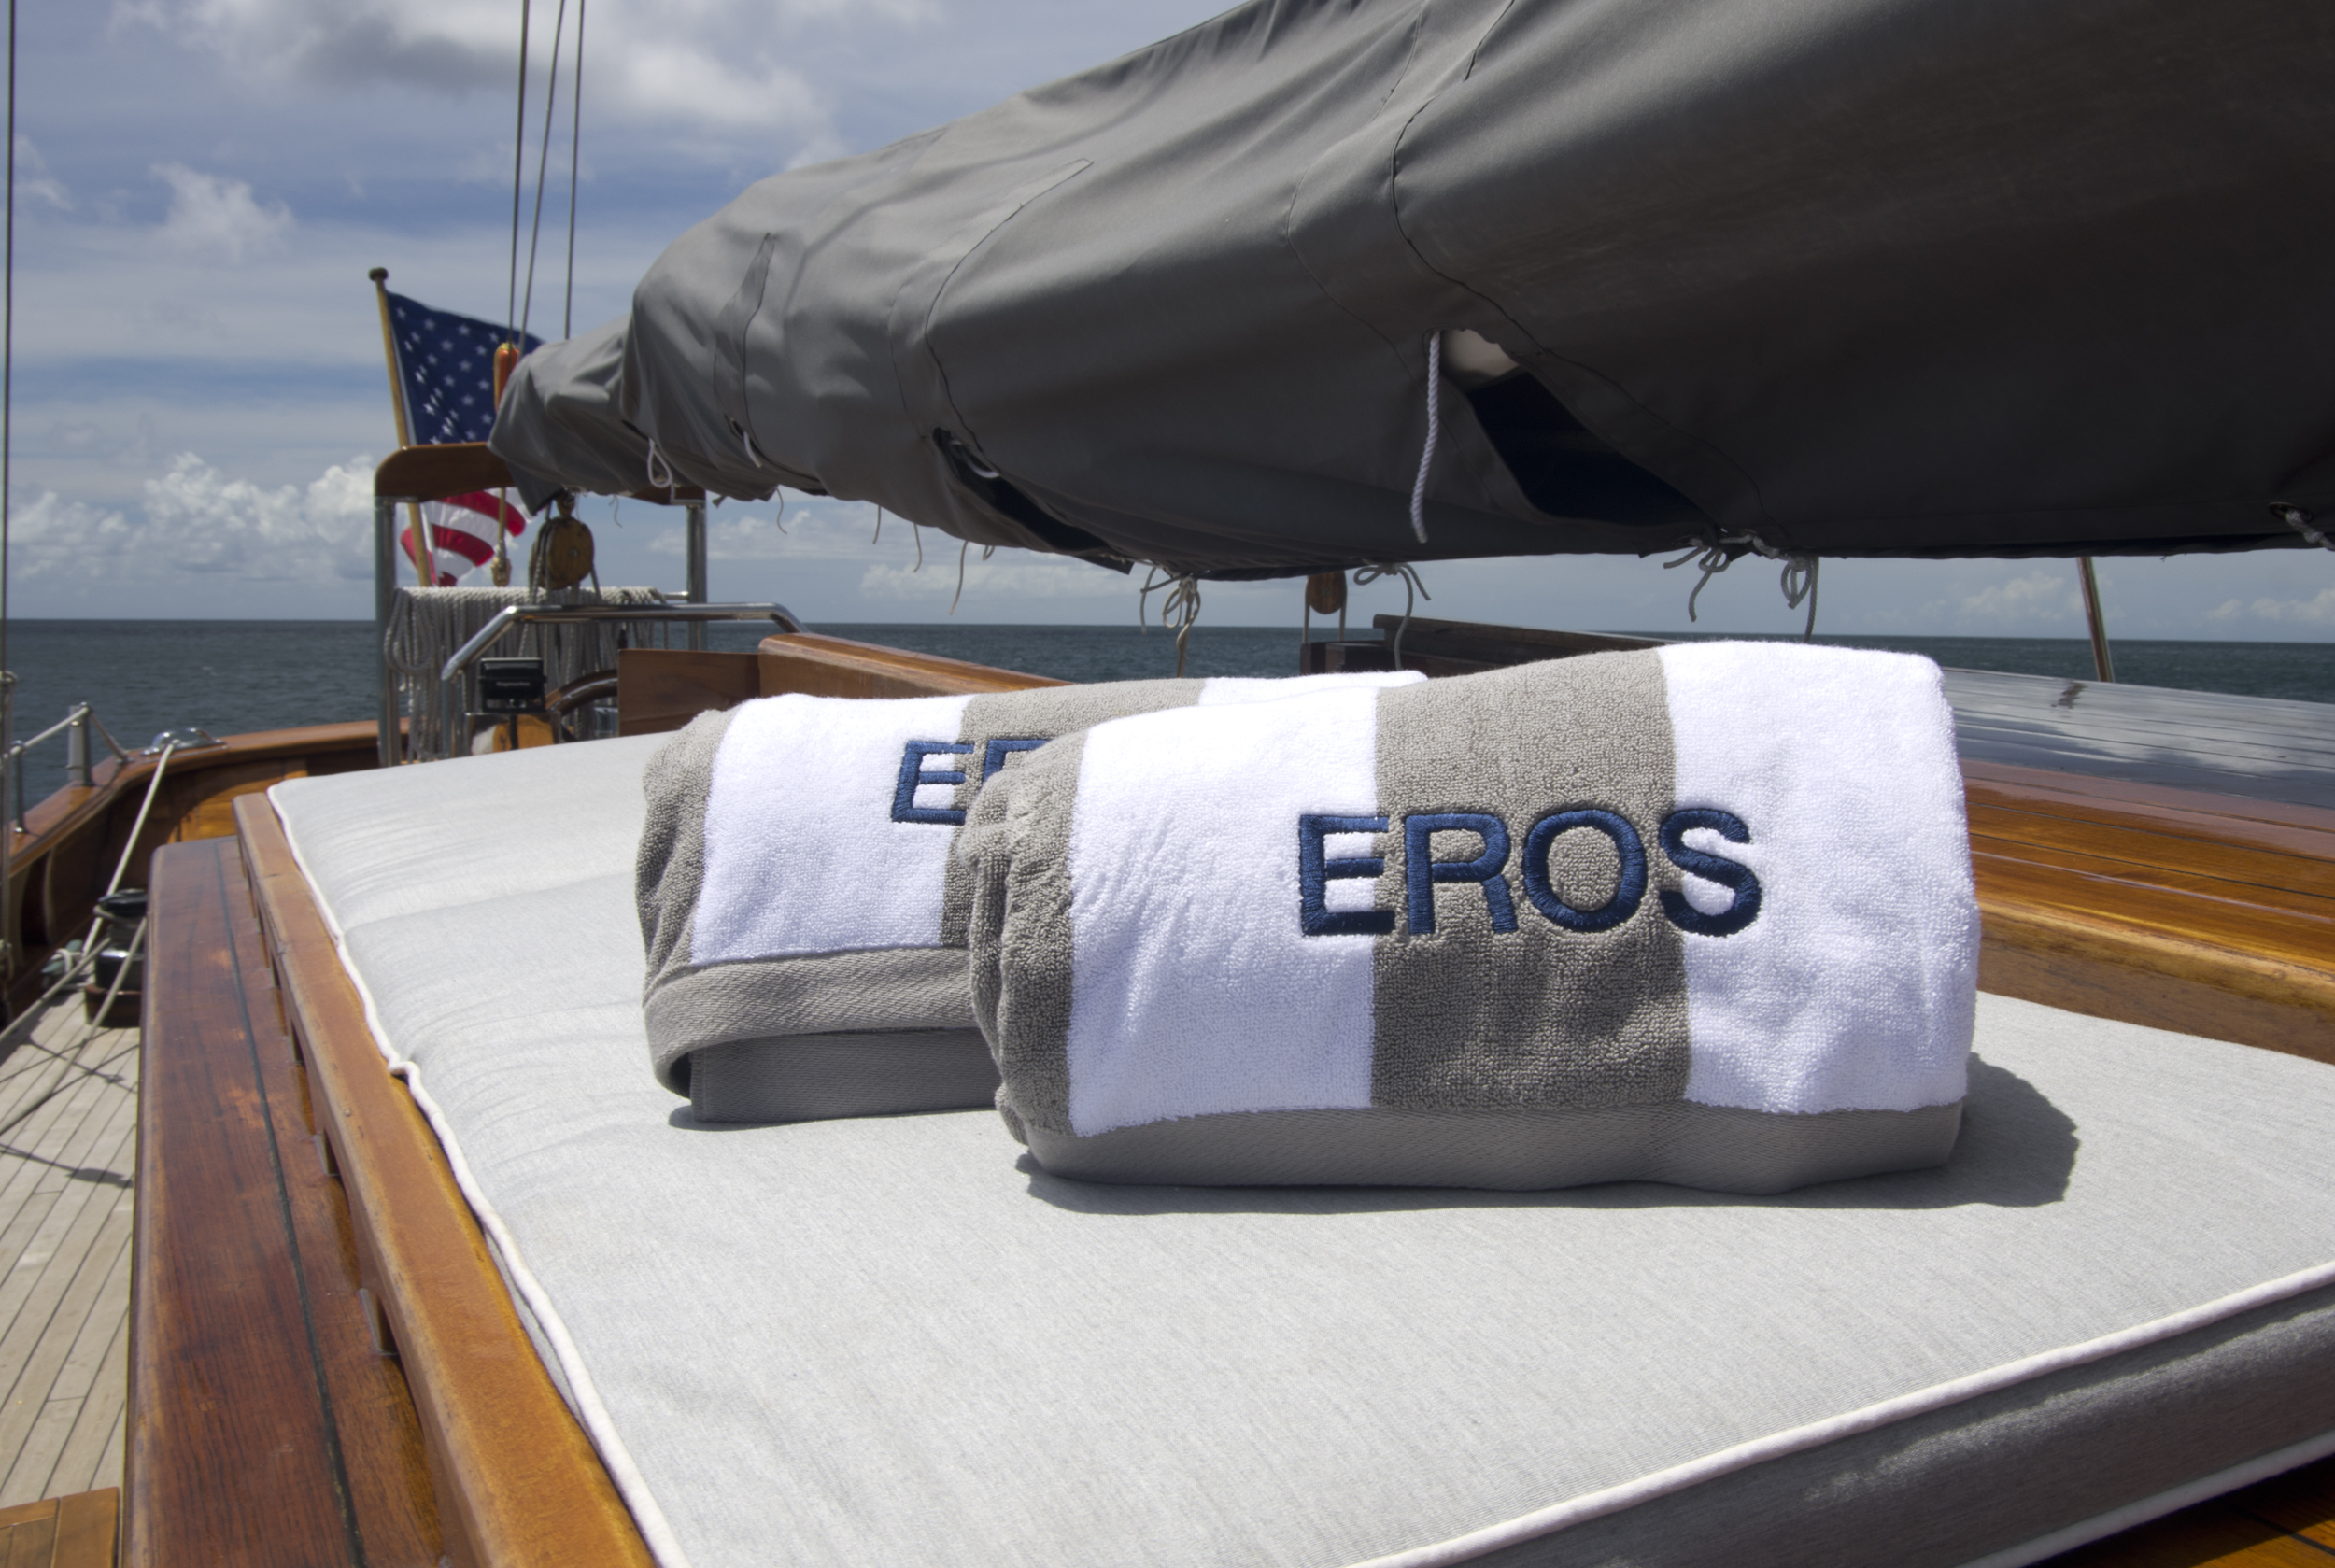 Eros Sunbathe Towels.jpg